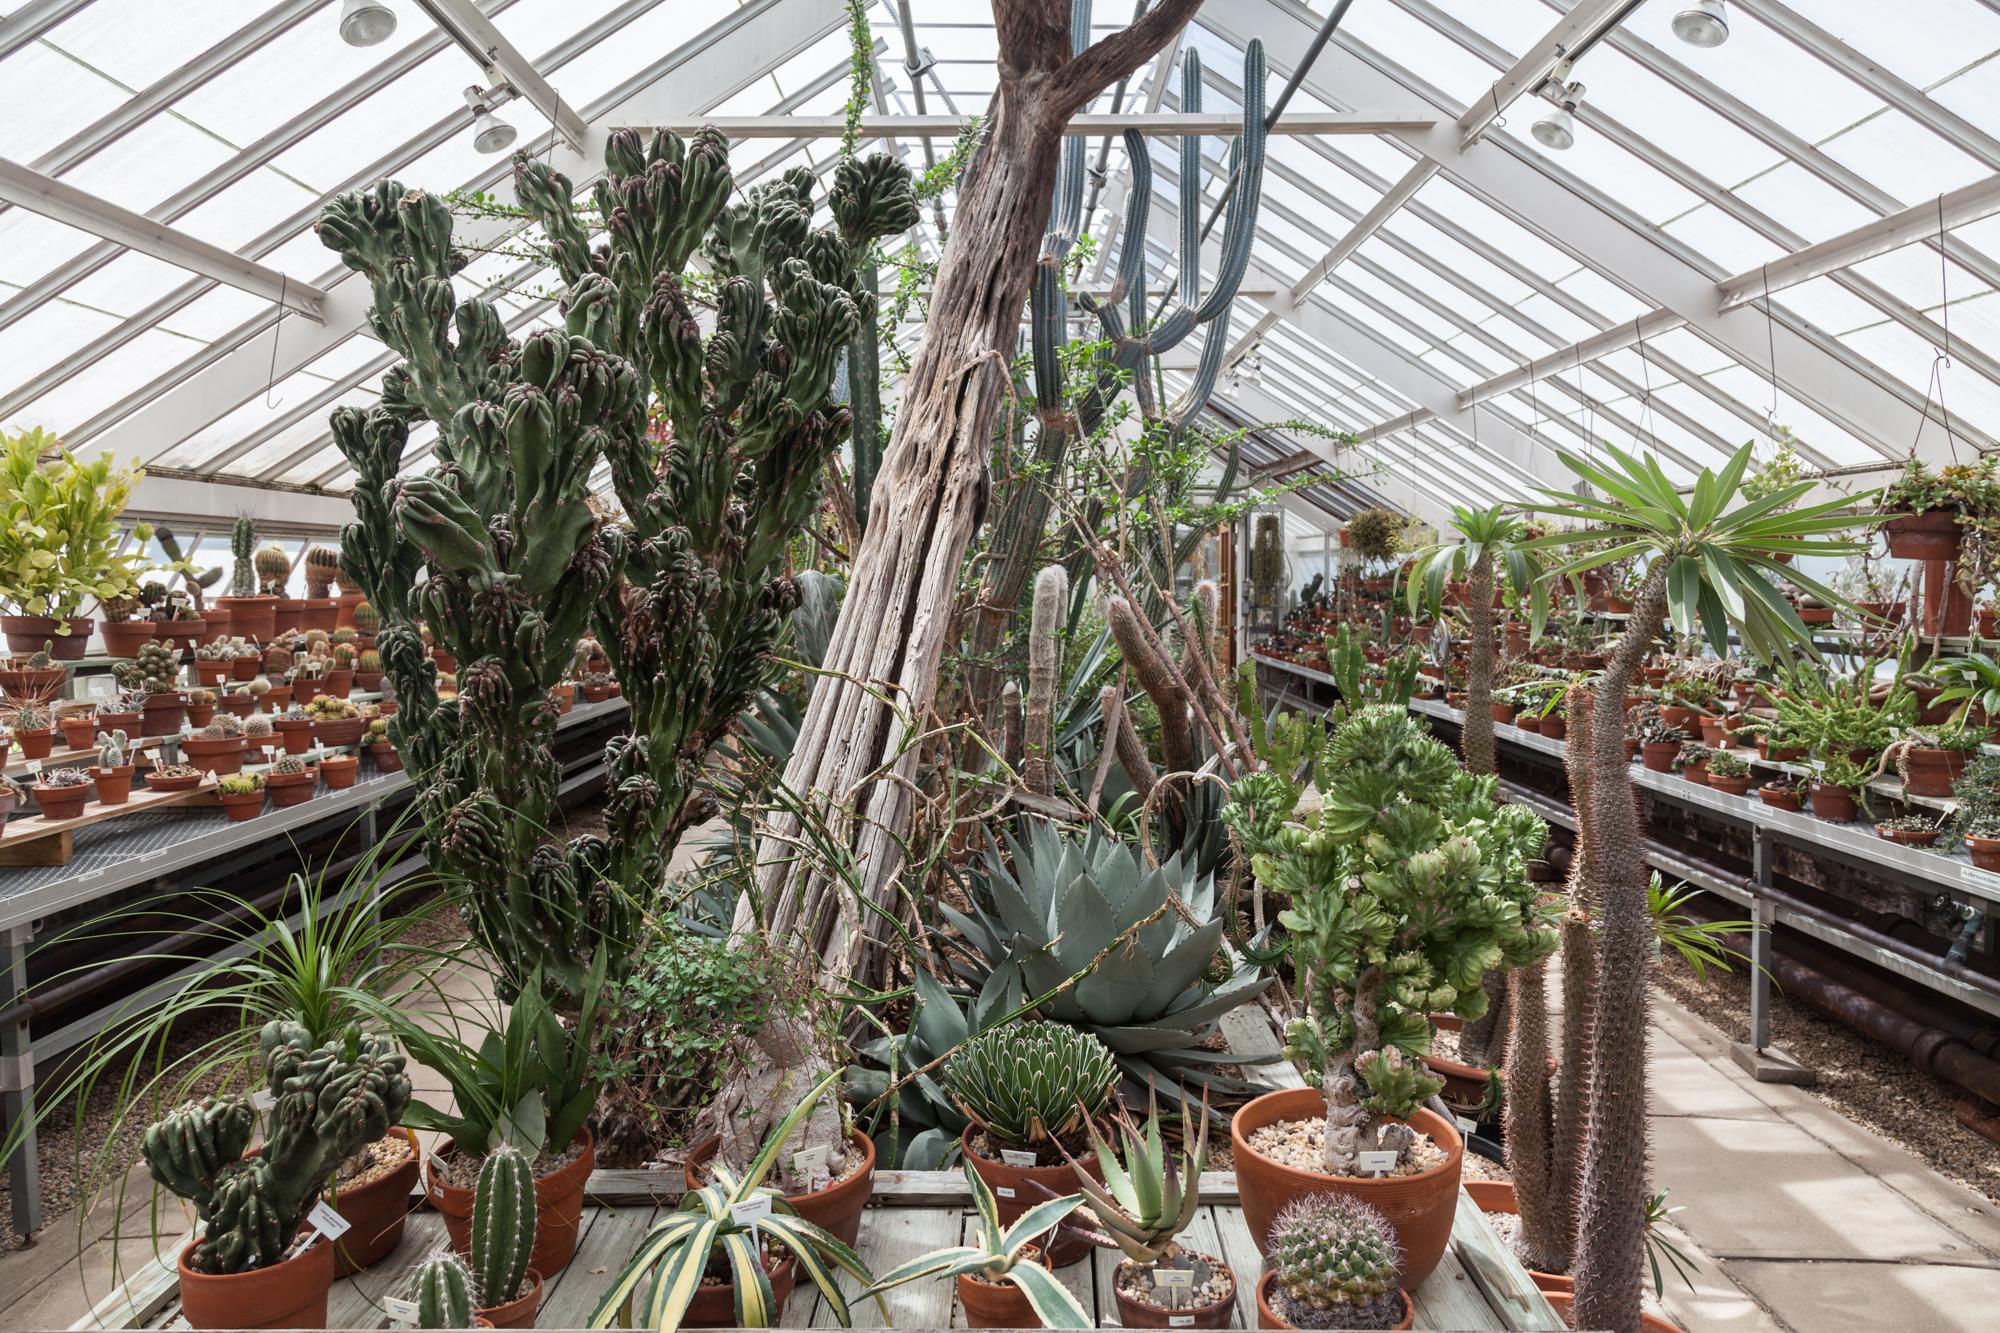 The cacti and succulent corner.